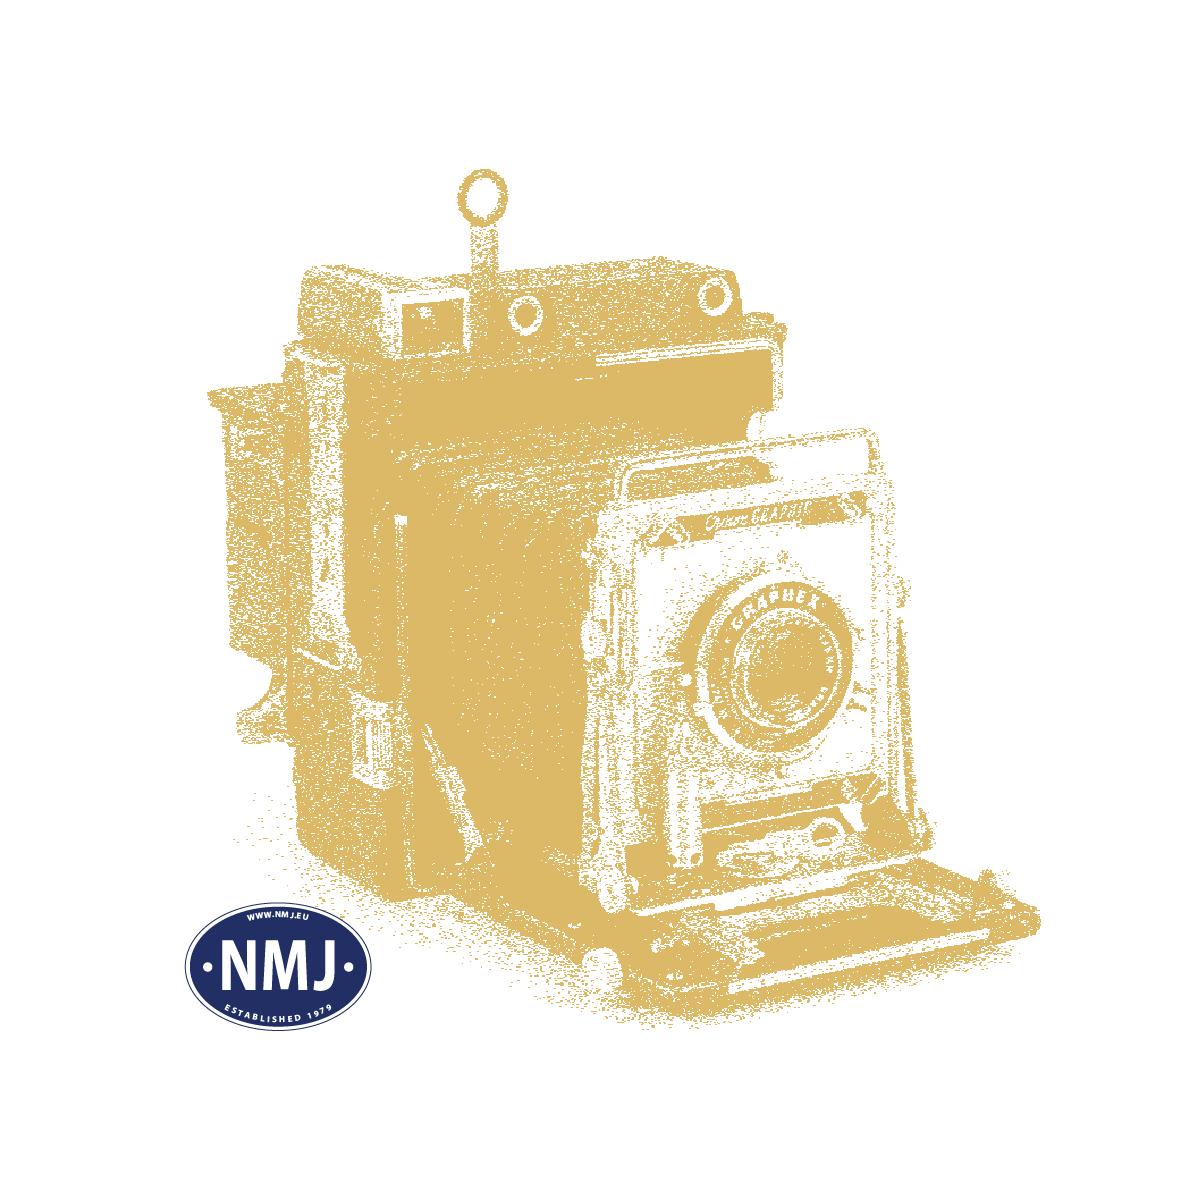 NMJT95103 - NMJ Topline DSB MY 1148, AC Digital